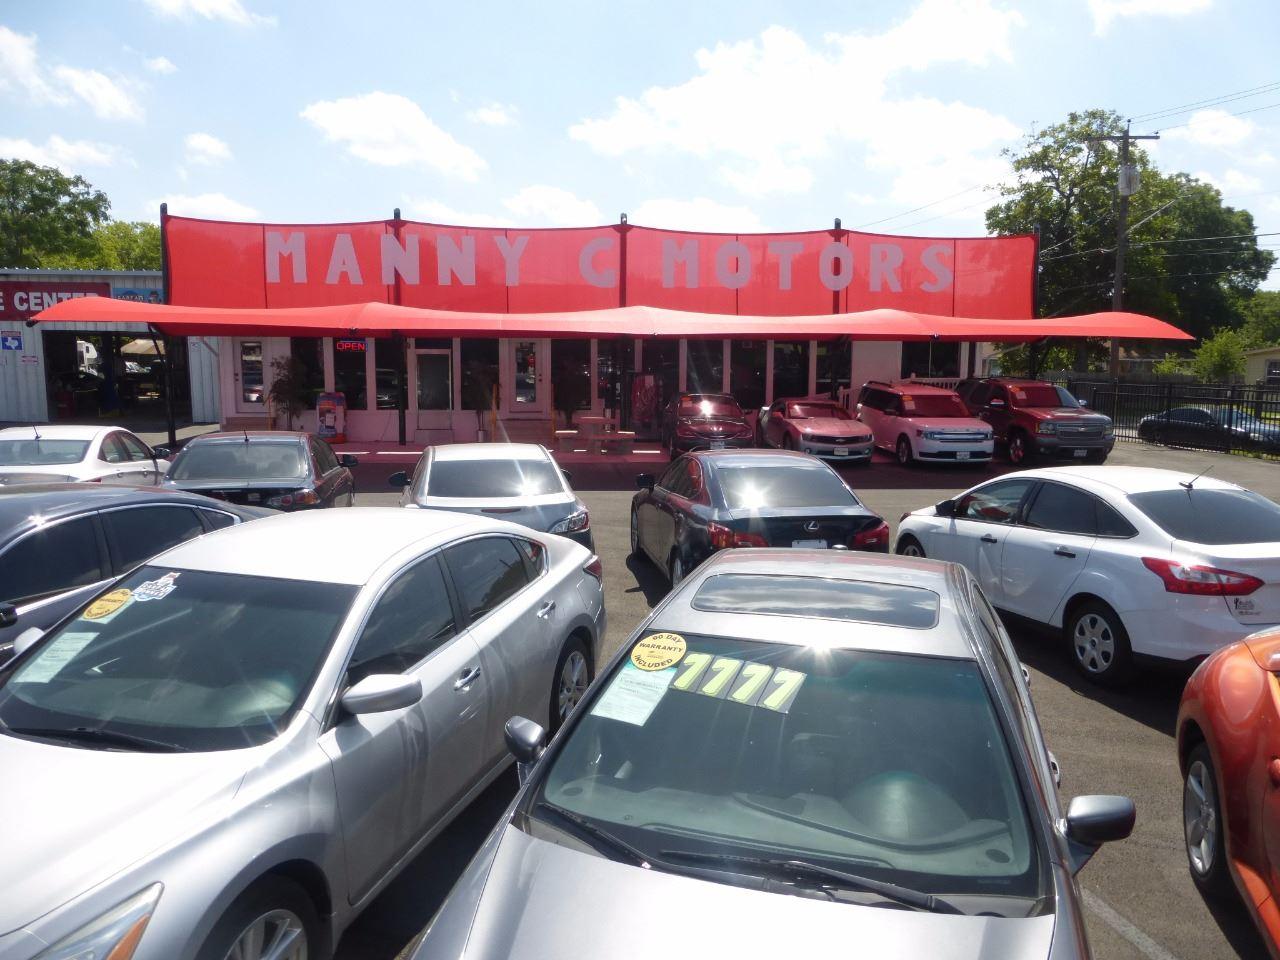 Manny G Motors